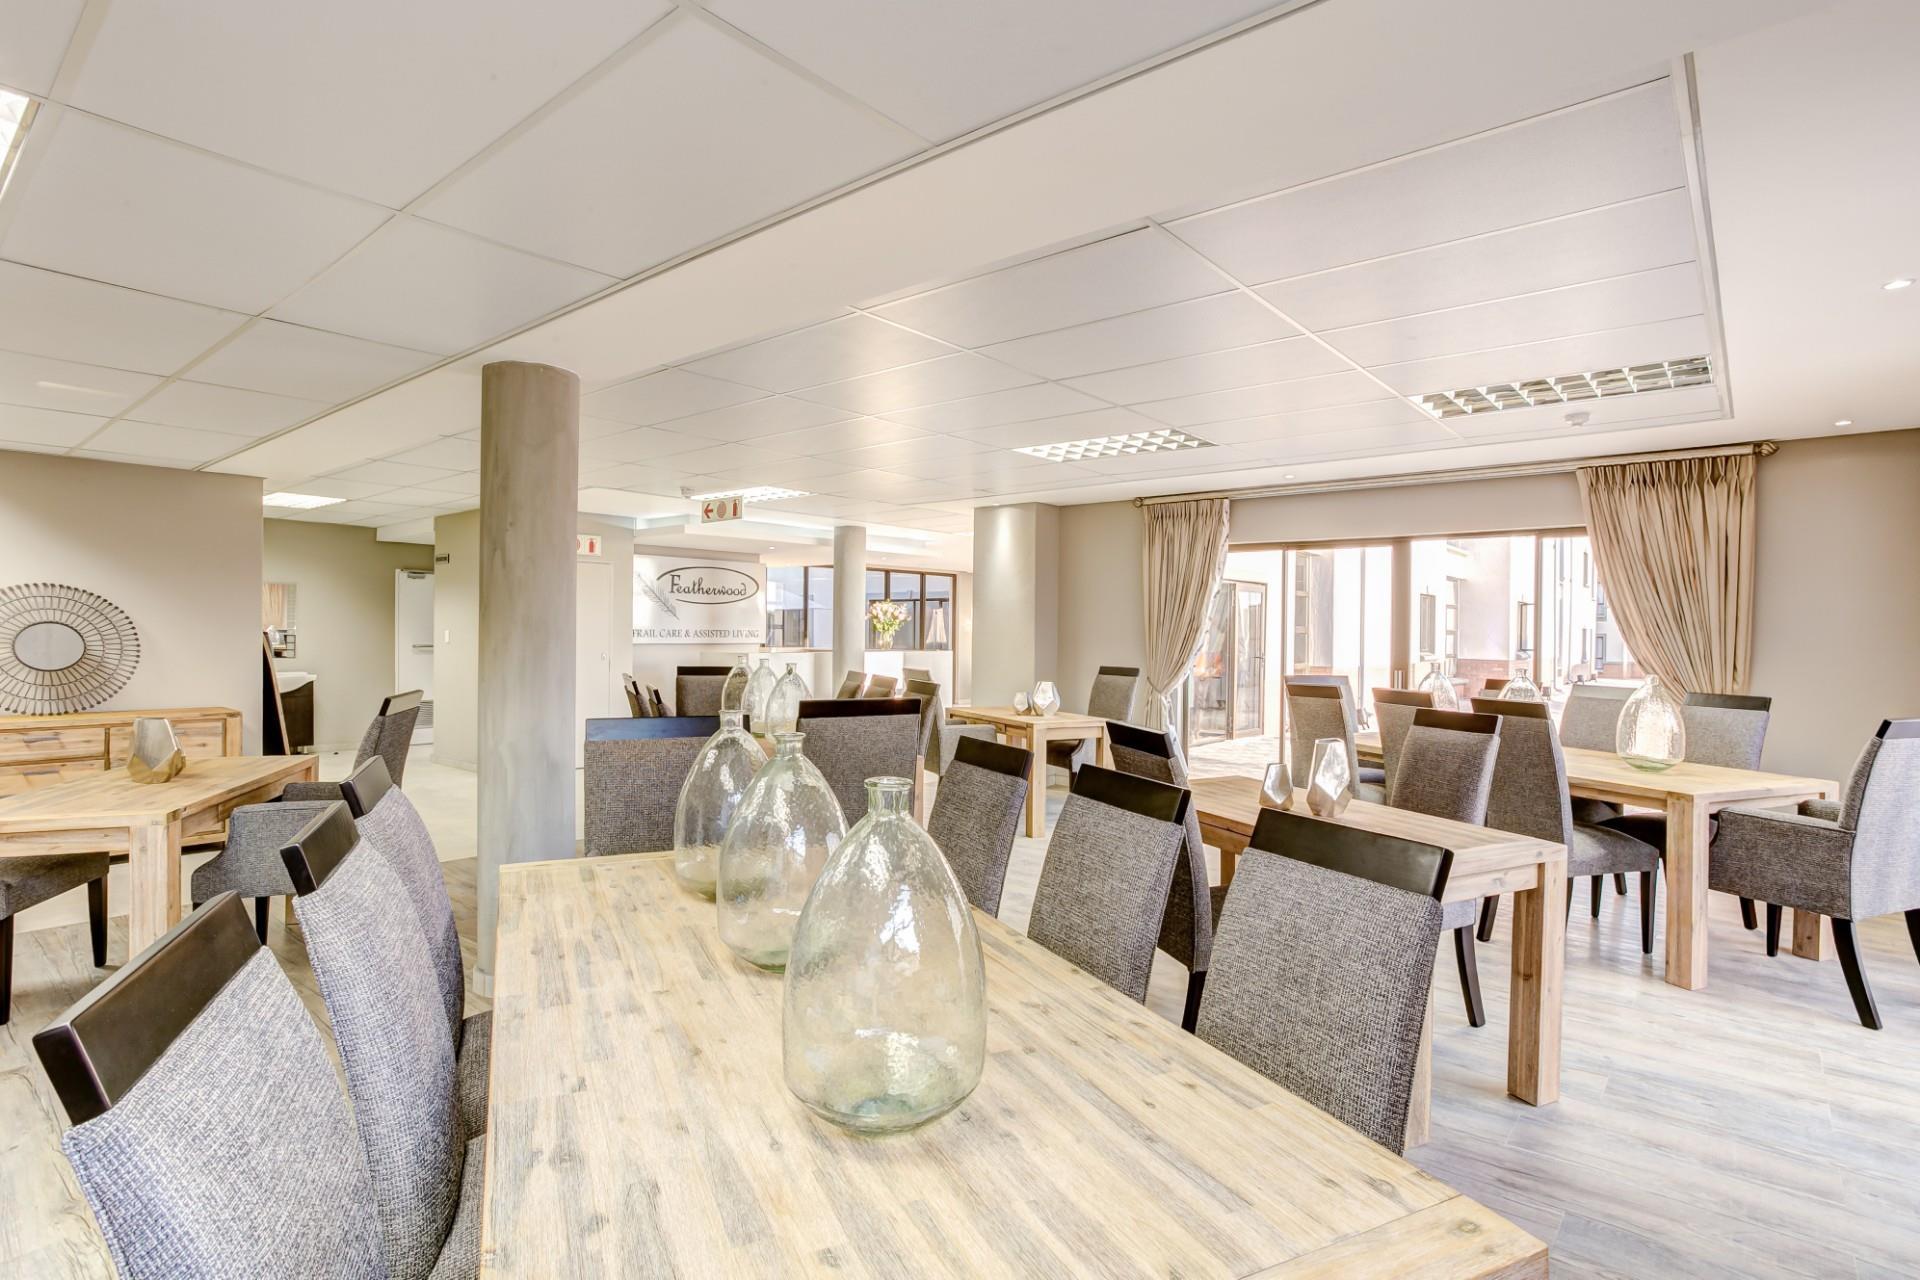 2 bedroom Apartment in Pretoriuspark | RE/MAX